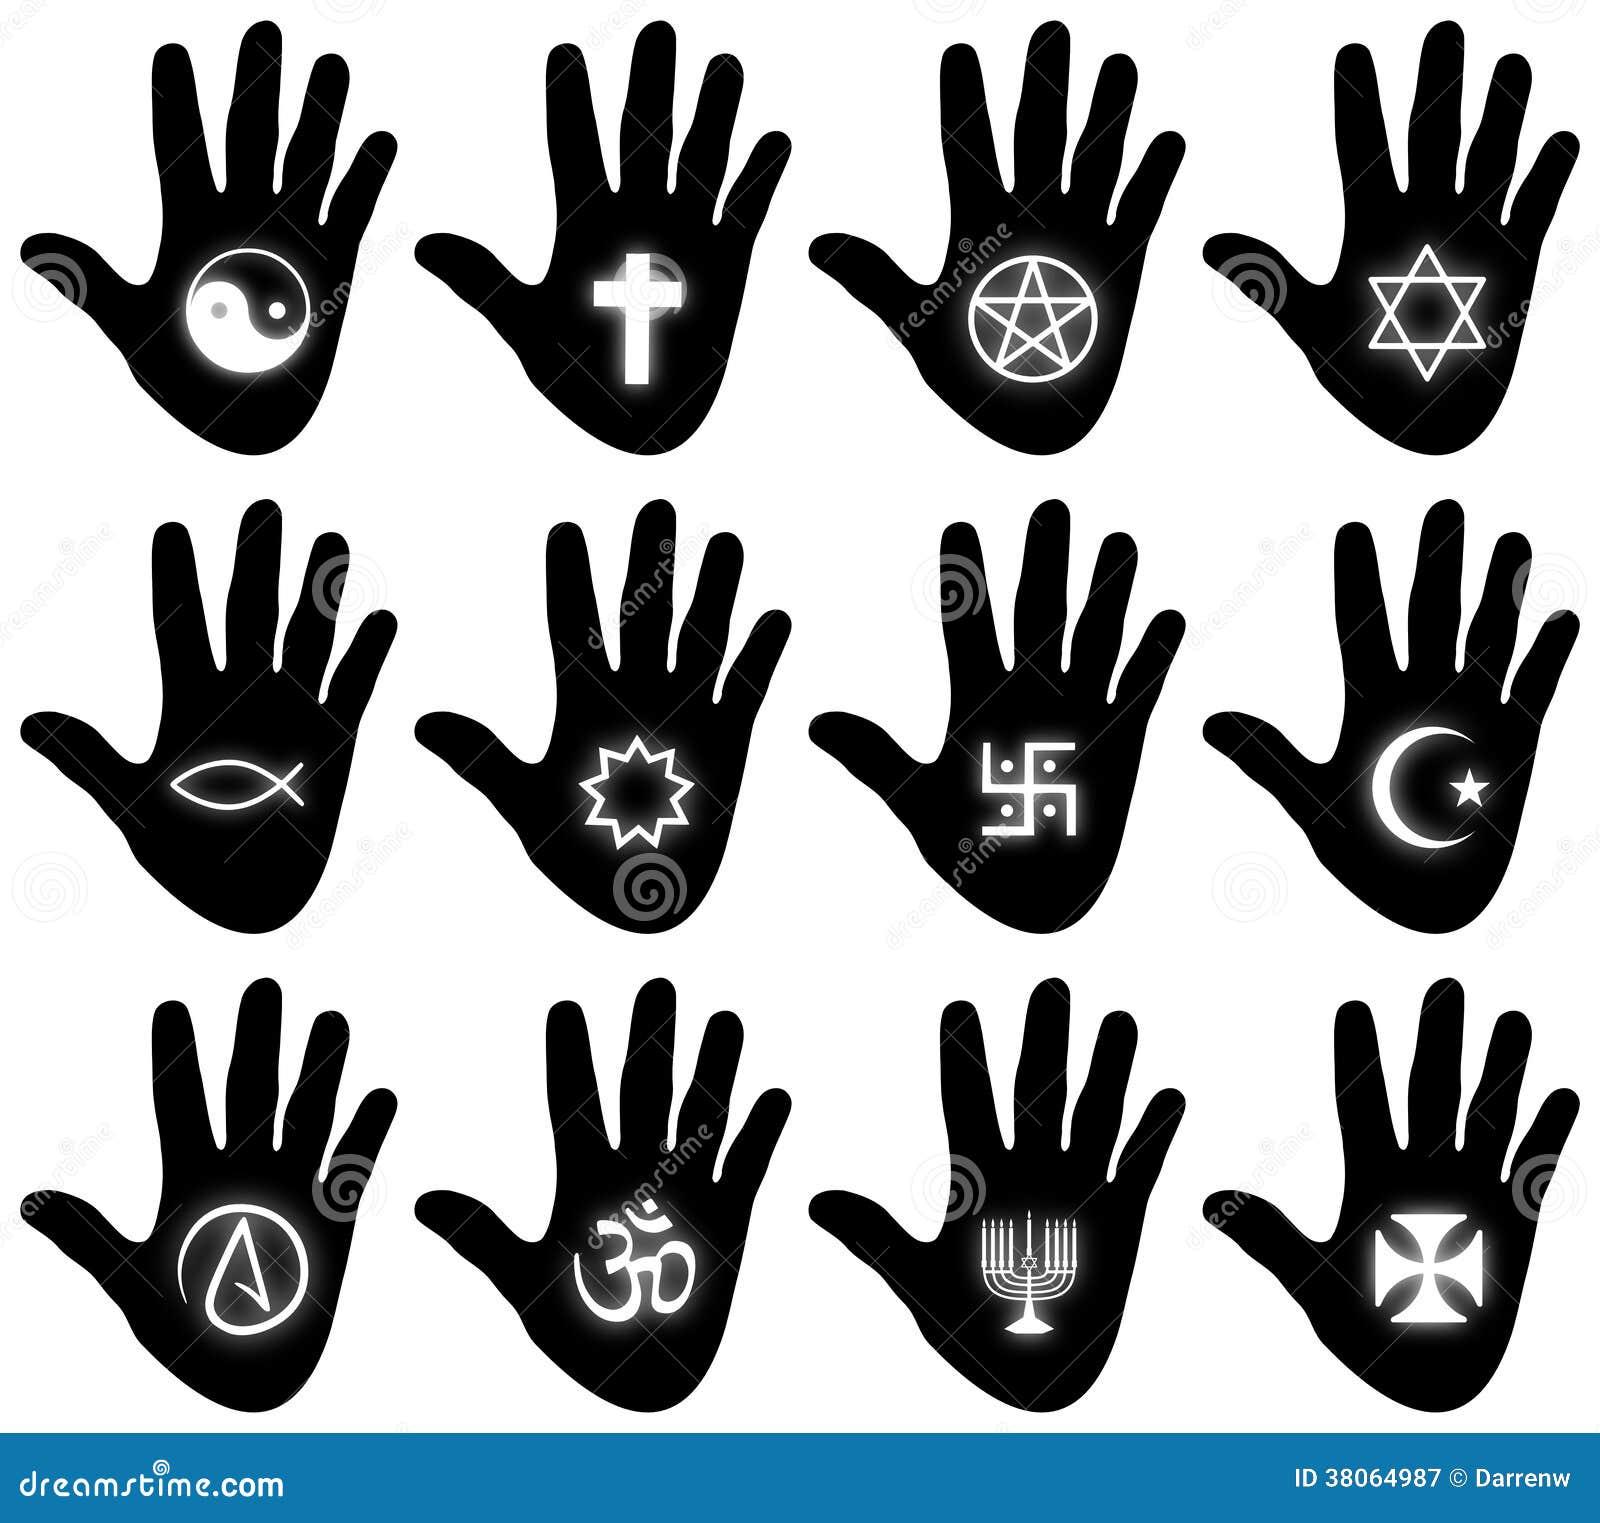 Religious Hand Symbols Stock Illustration Illustration Of Judaism